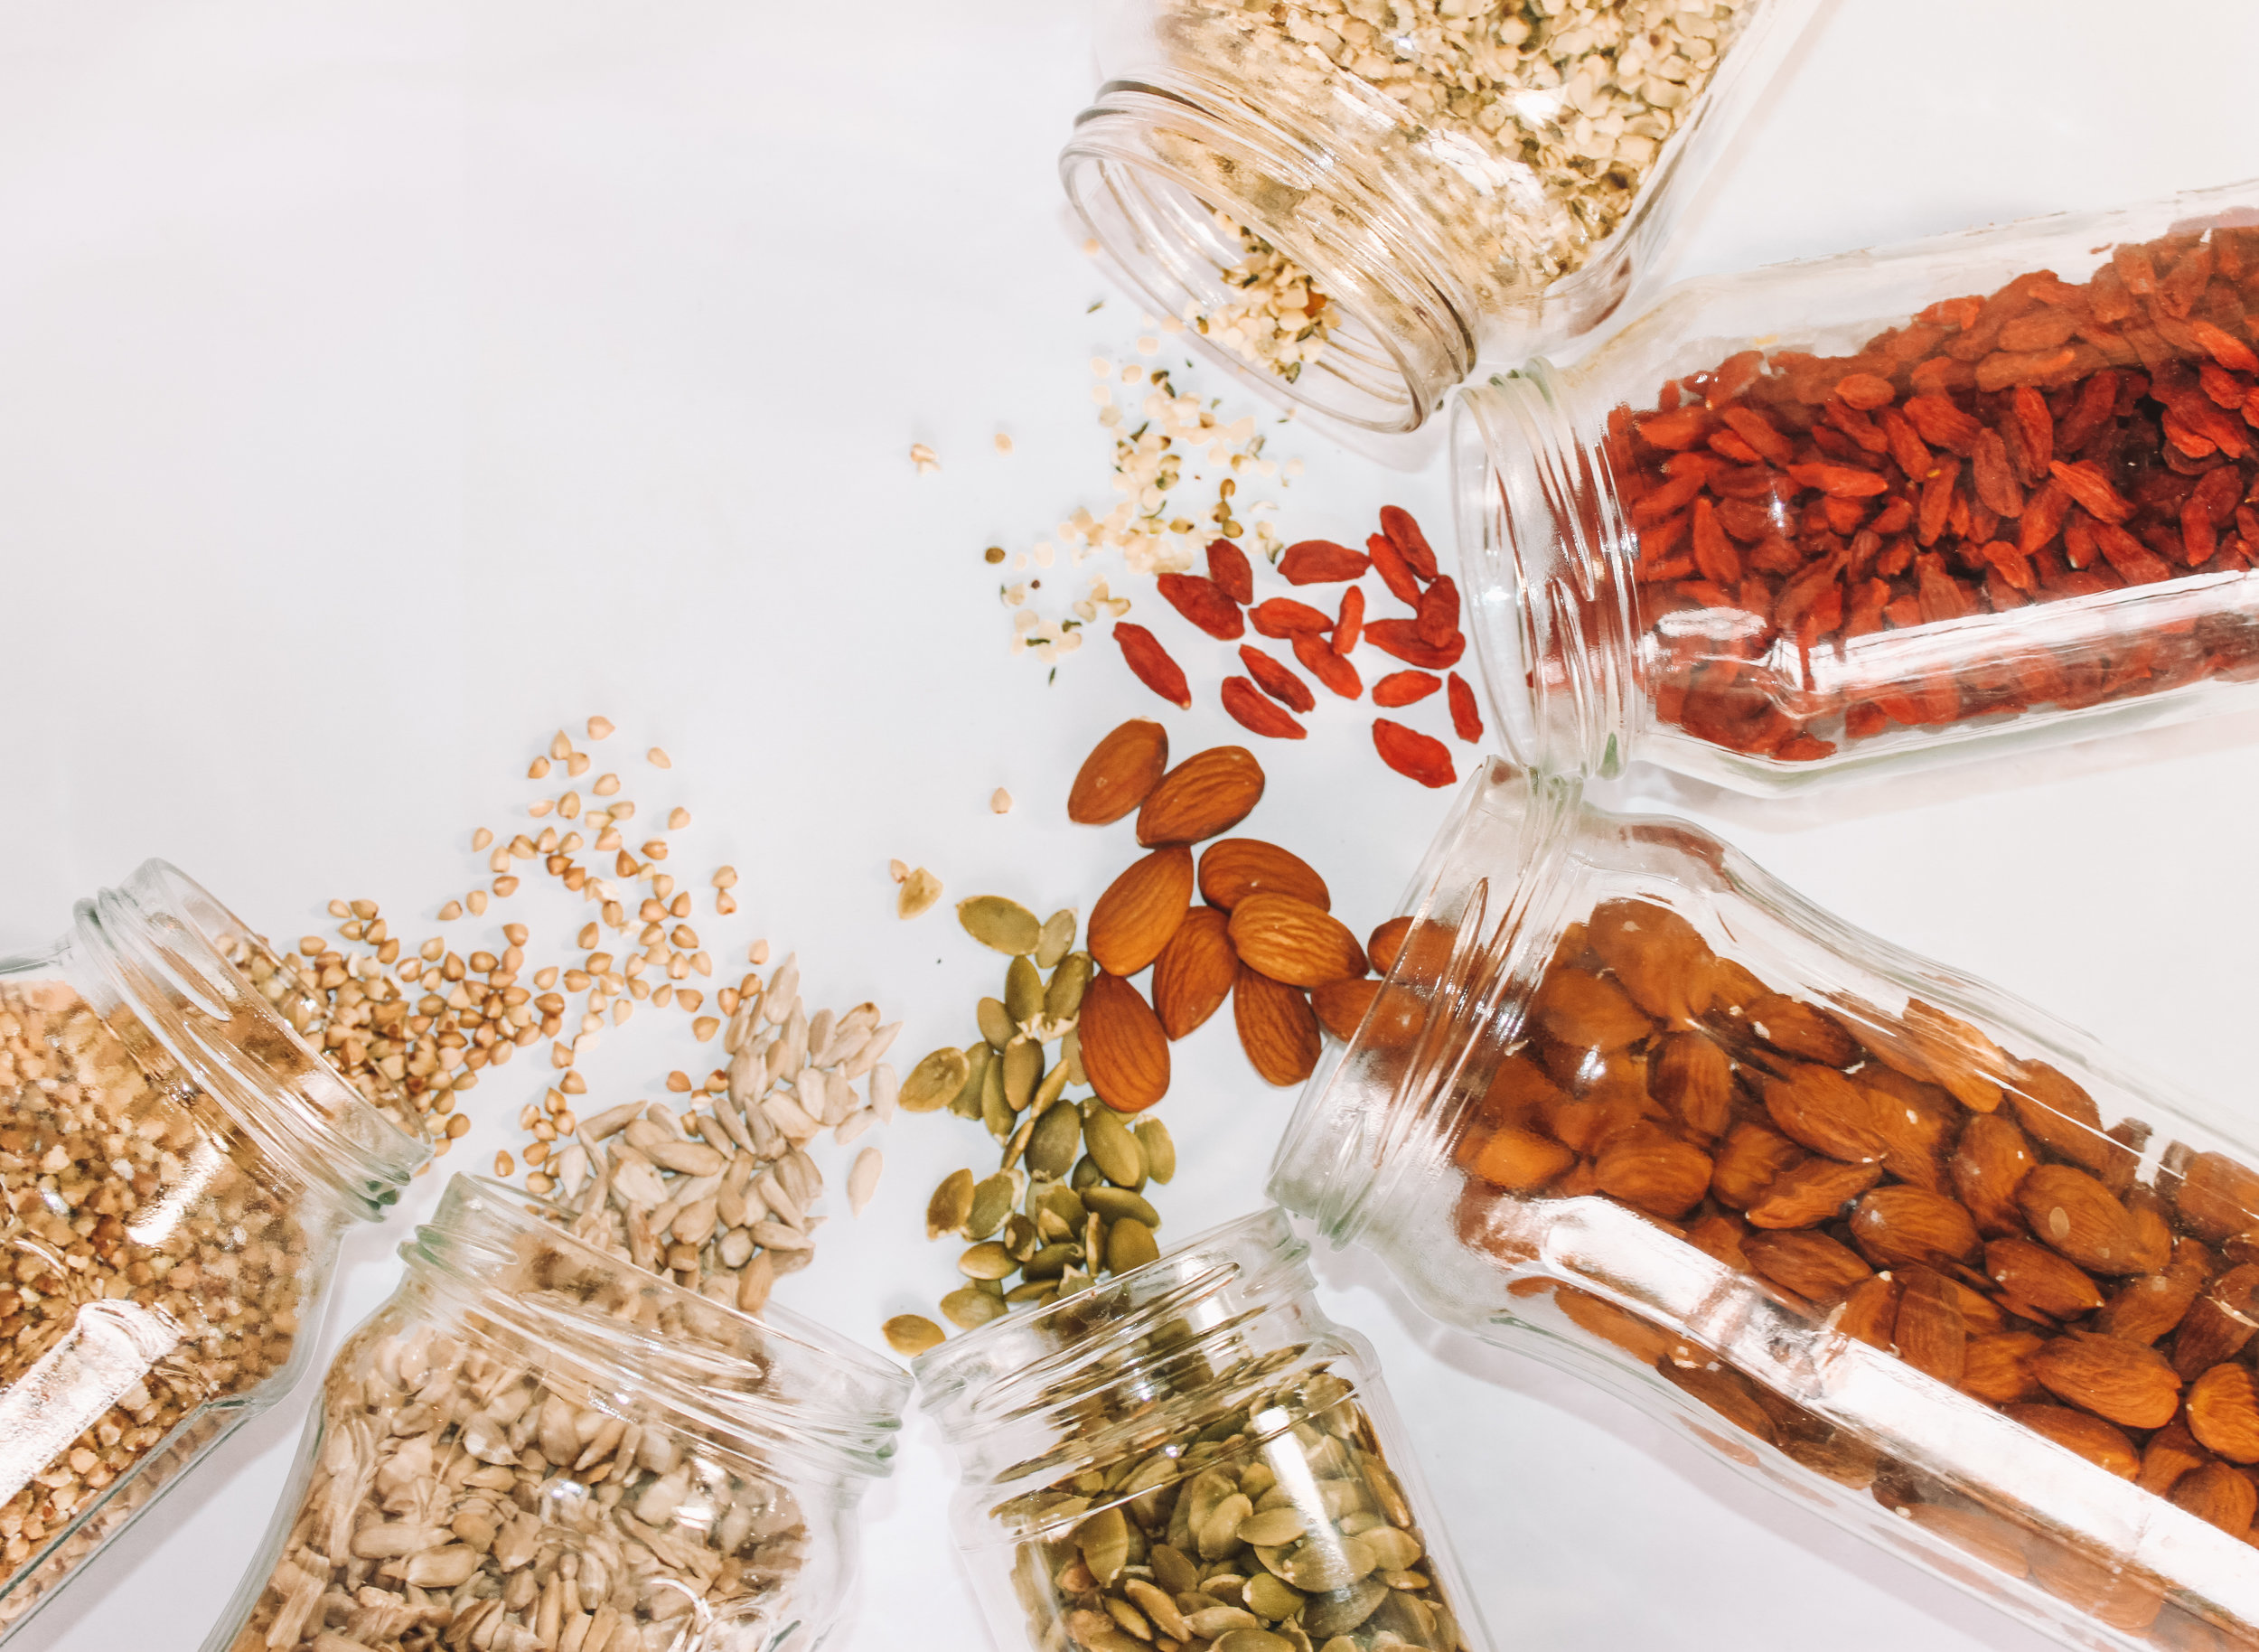 nuts & snacks -